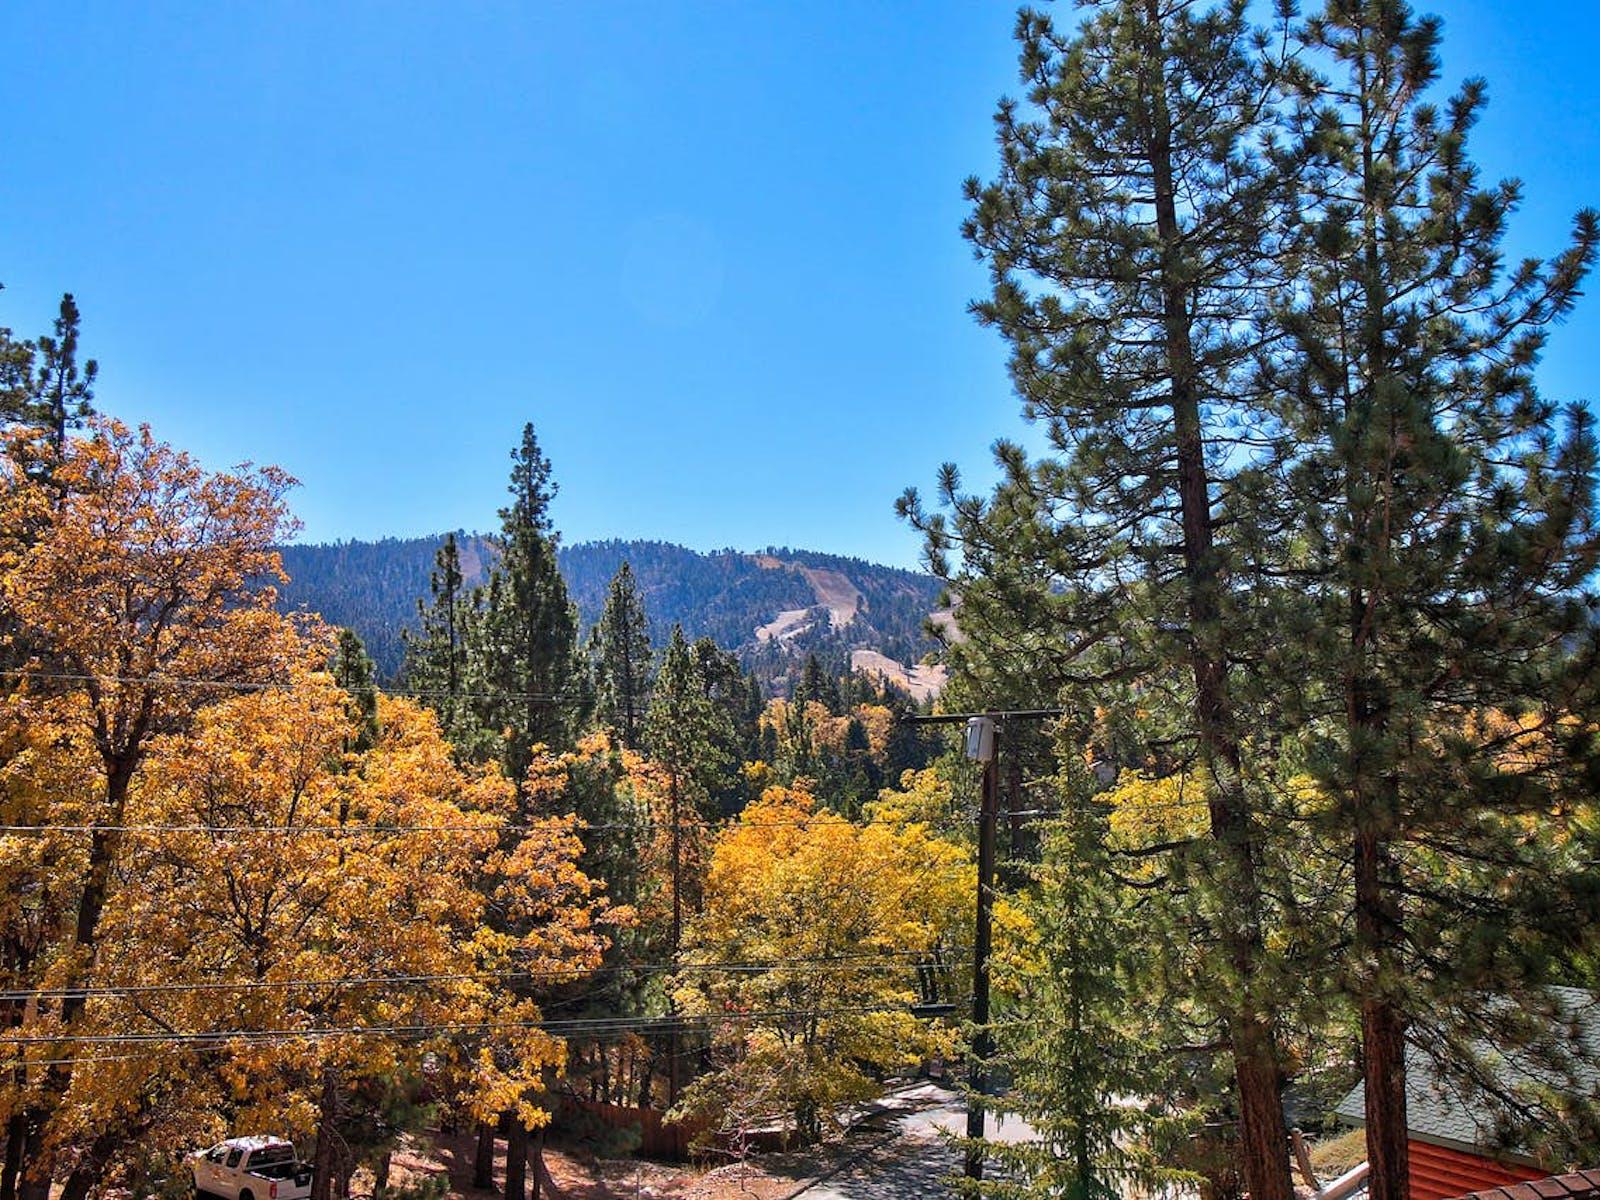 Pine trees surround beautiful Big Bear, CA